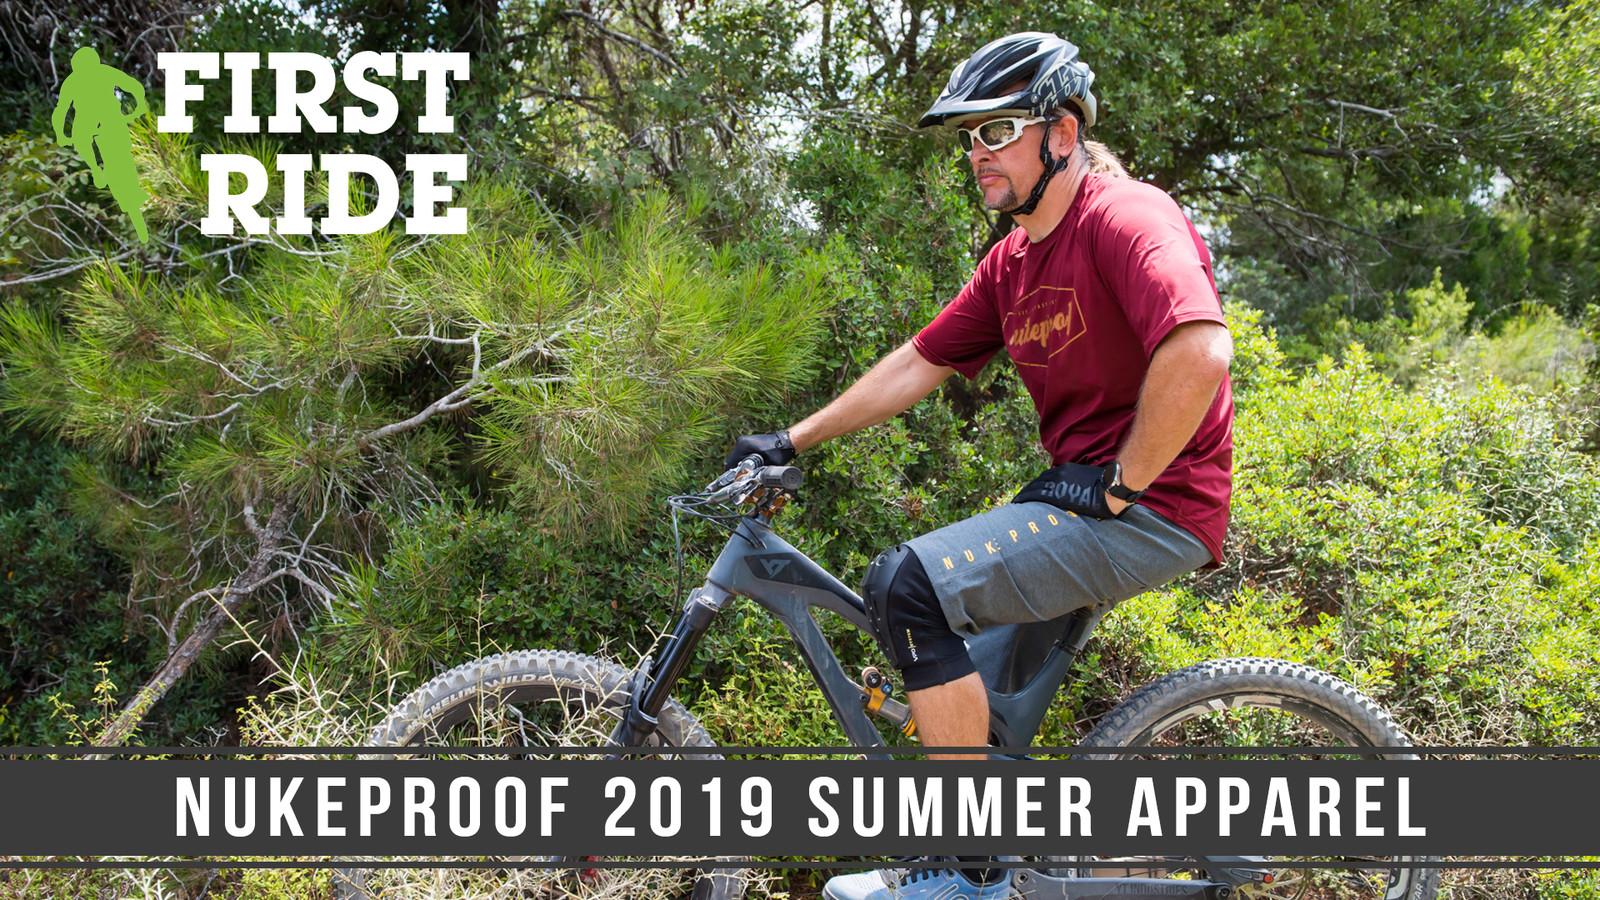 FOX RACING Motocross MTB MX Bicycle Race Dirt Mountain Bikes Racing KEY LANYARD